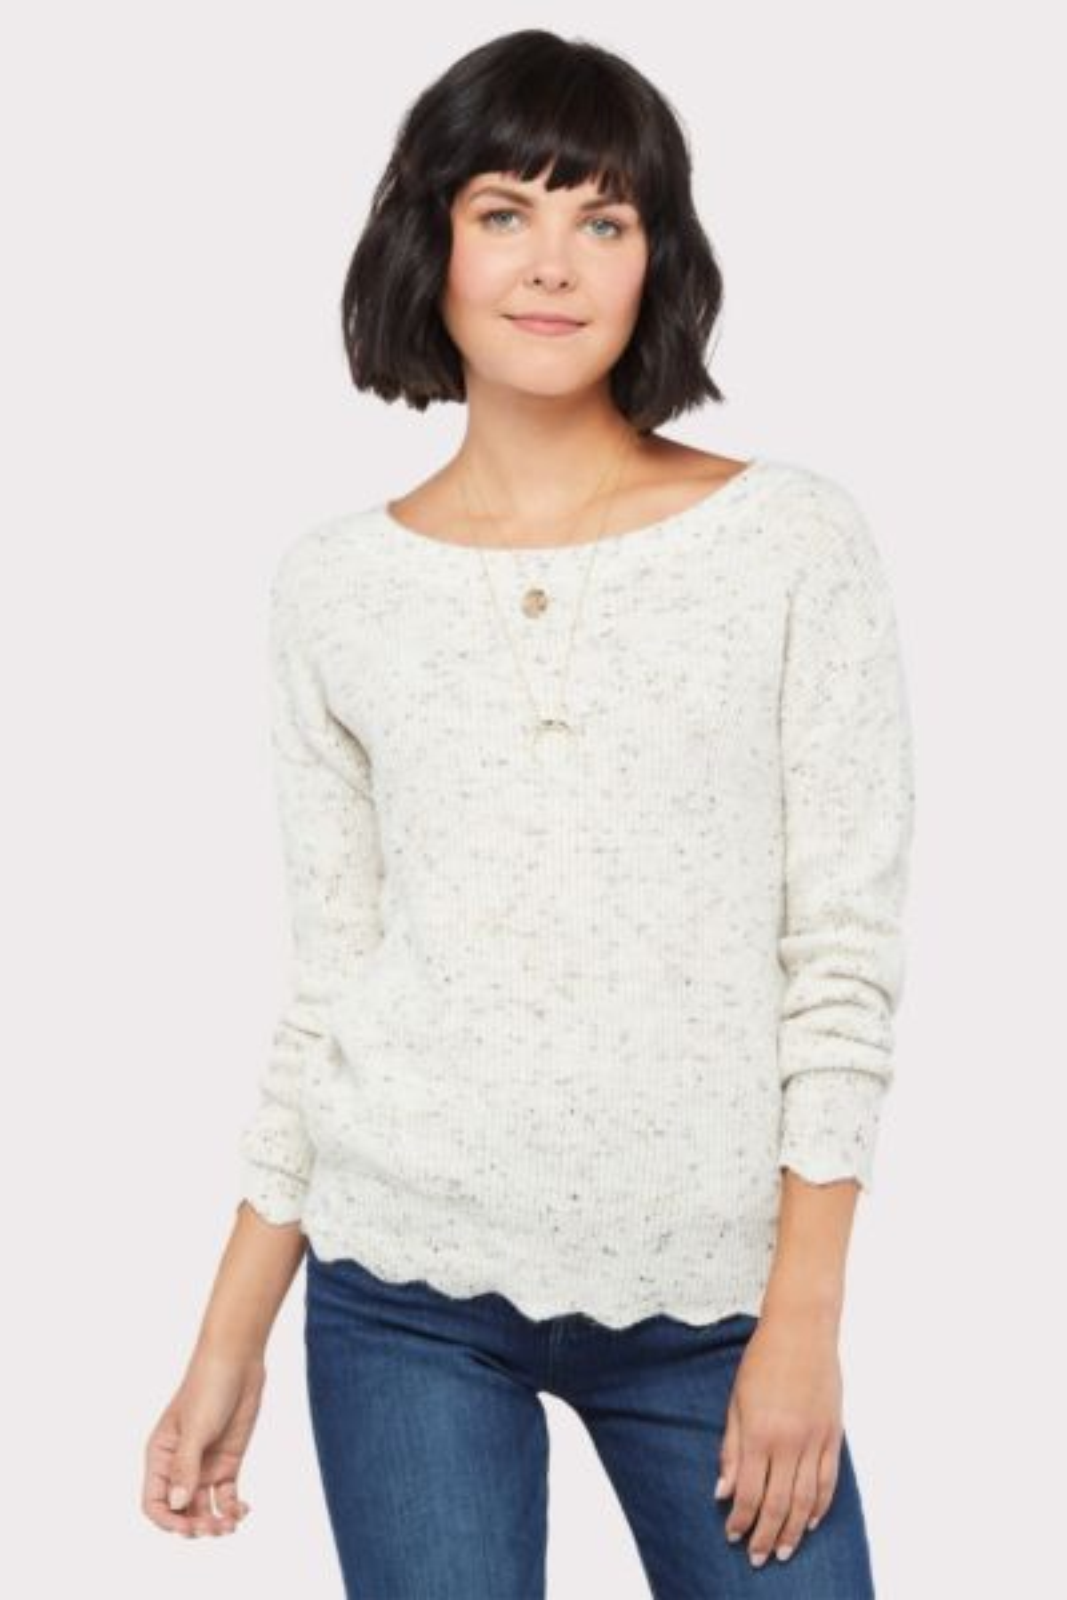 Allison joy Kristina Donegal Sweater